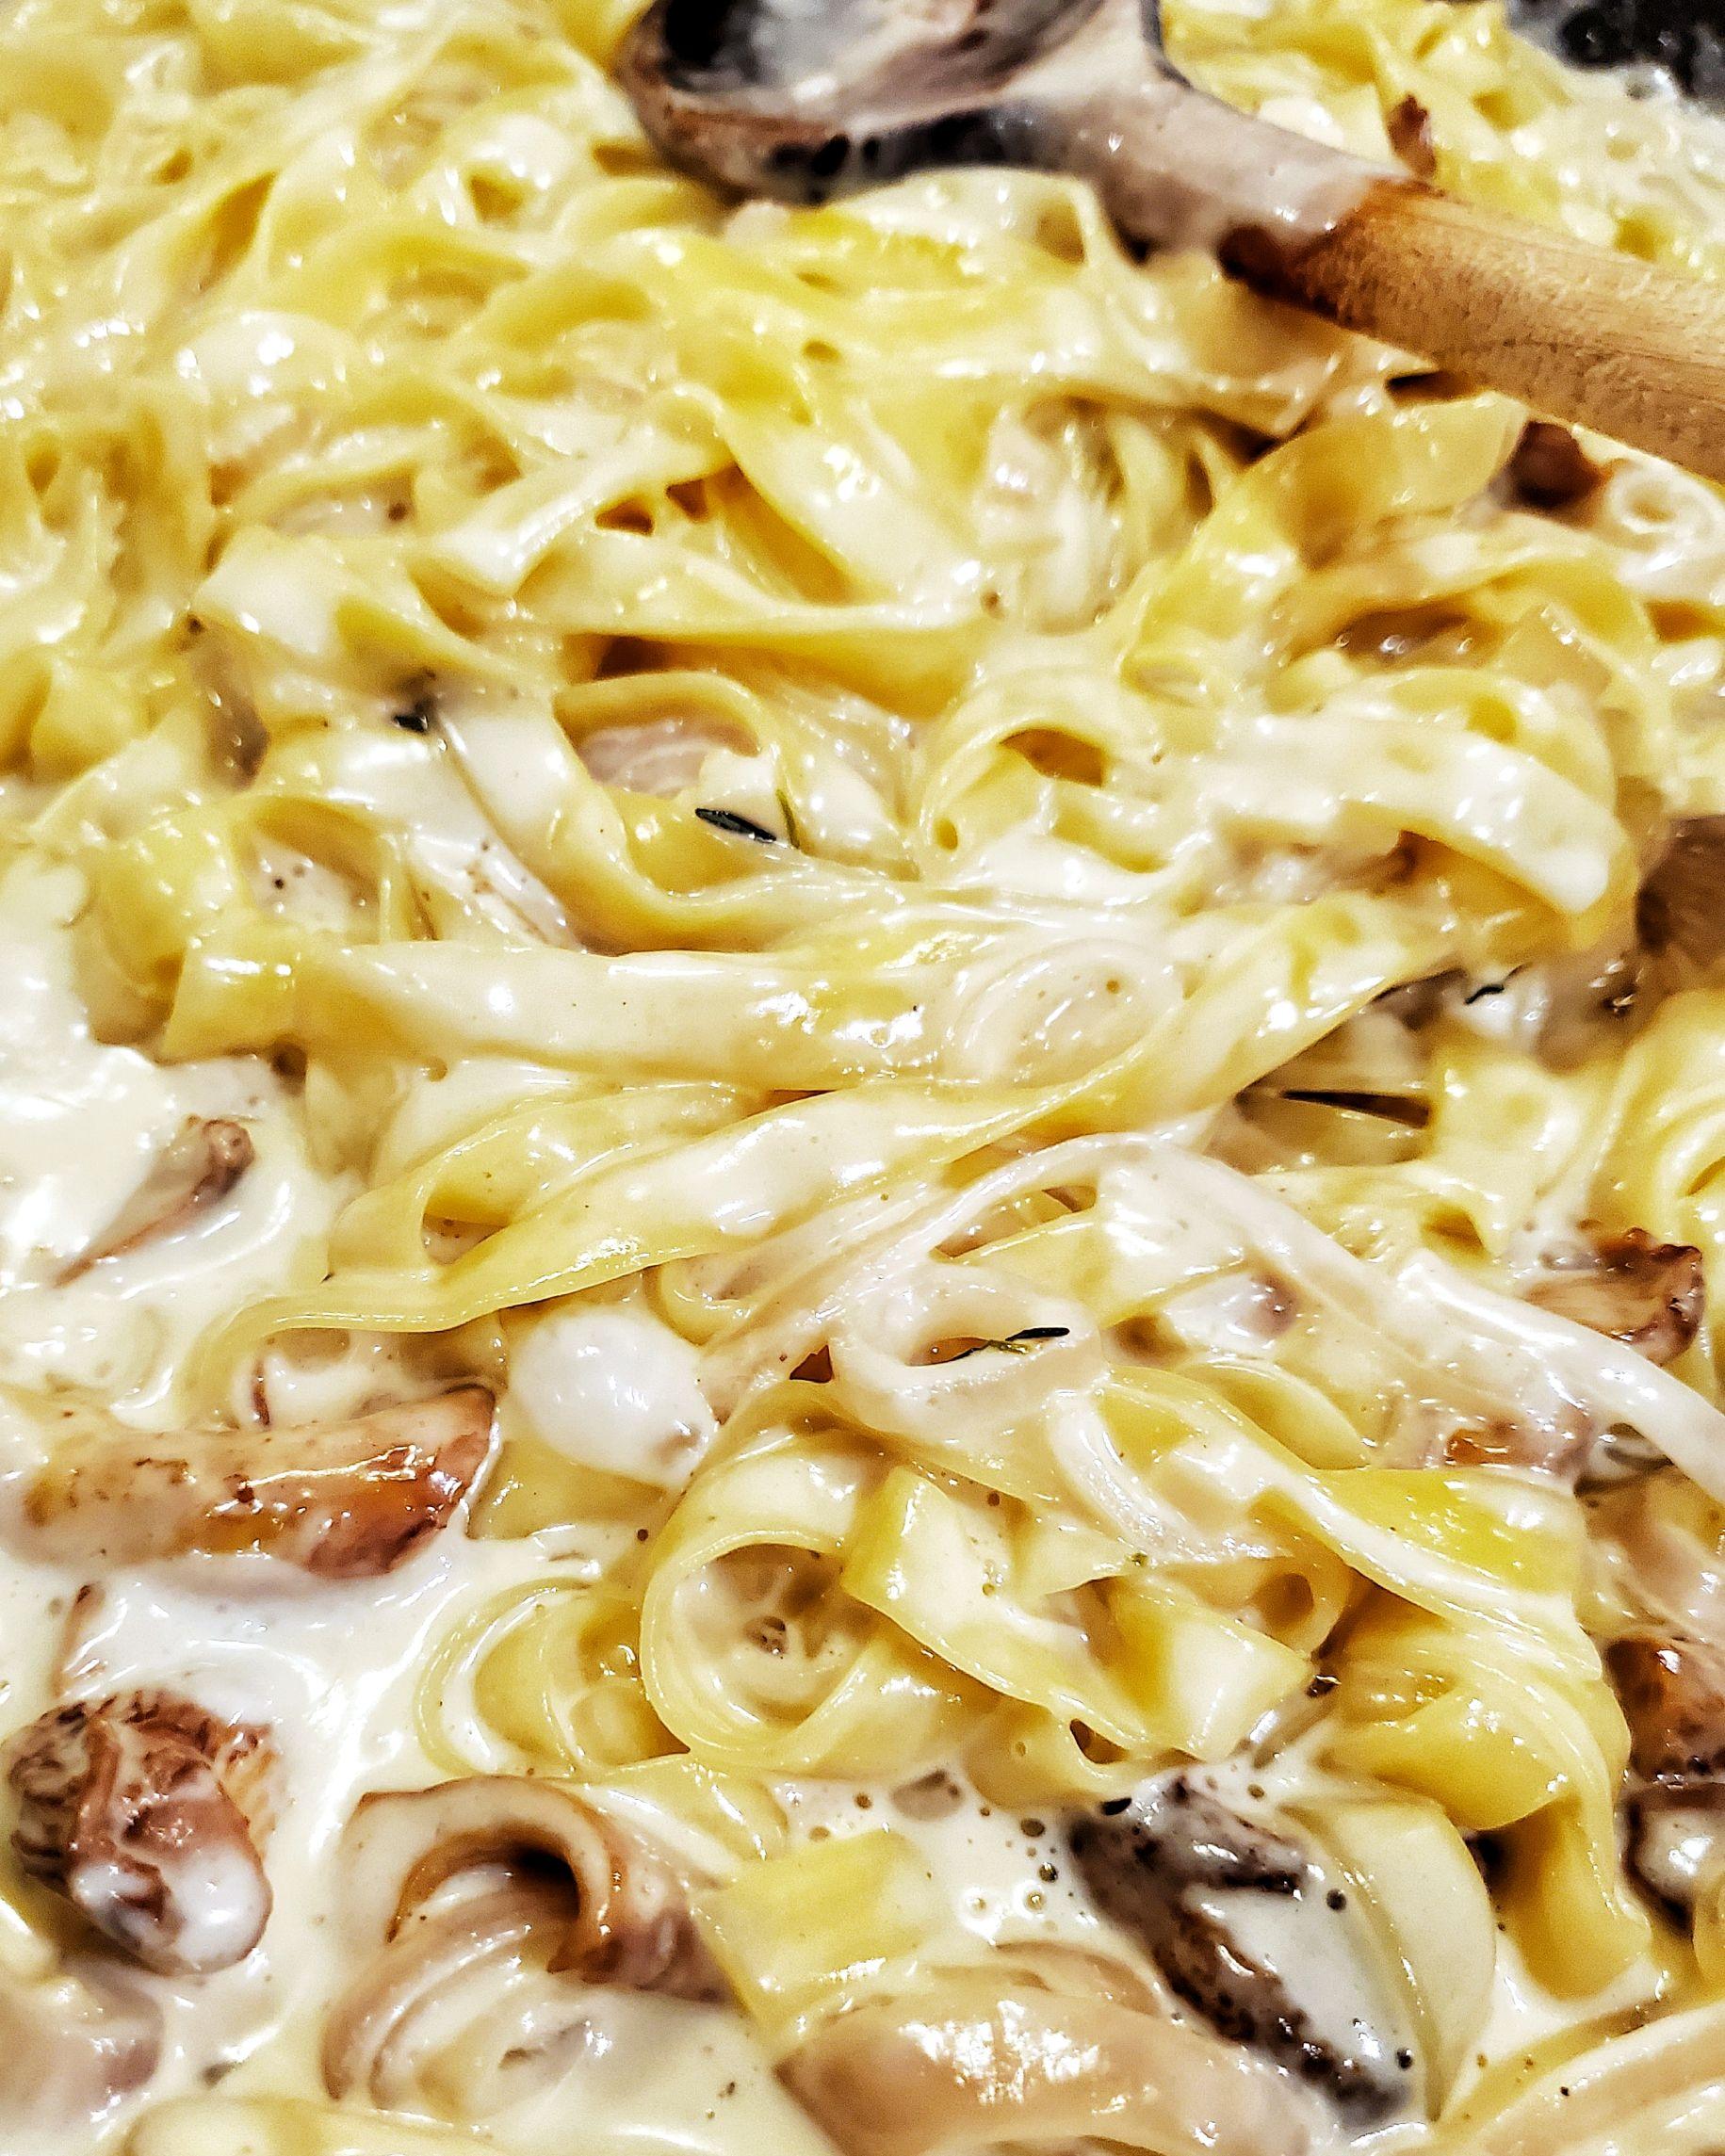 Creamy chanterelle pasta in skillet